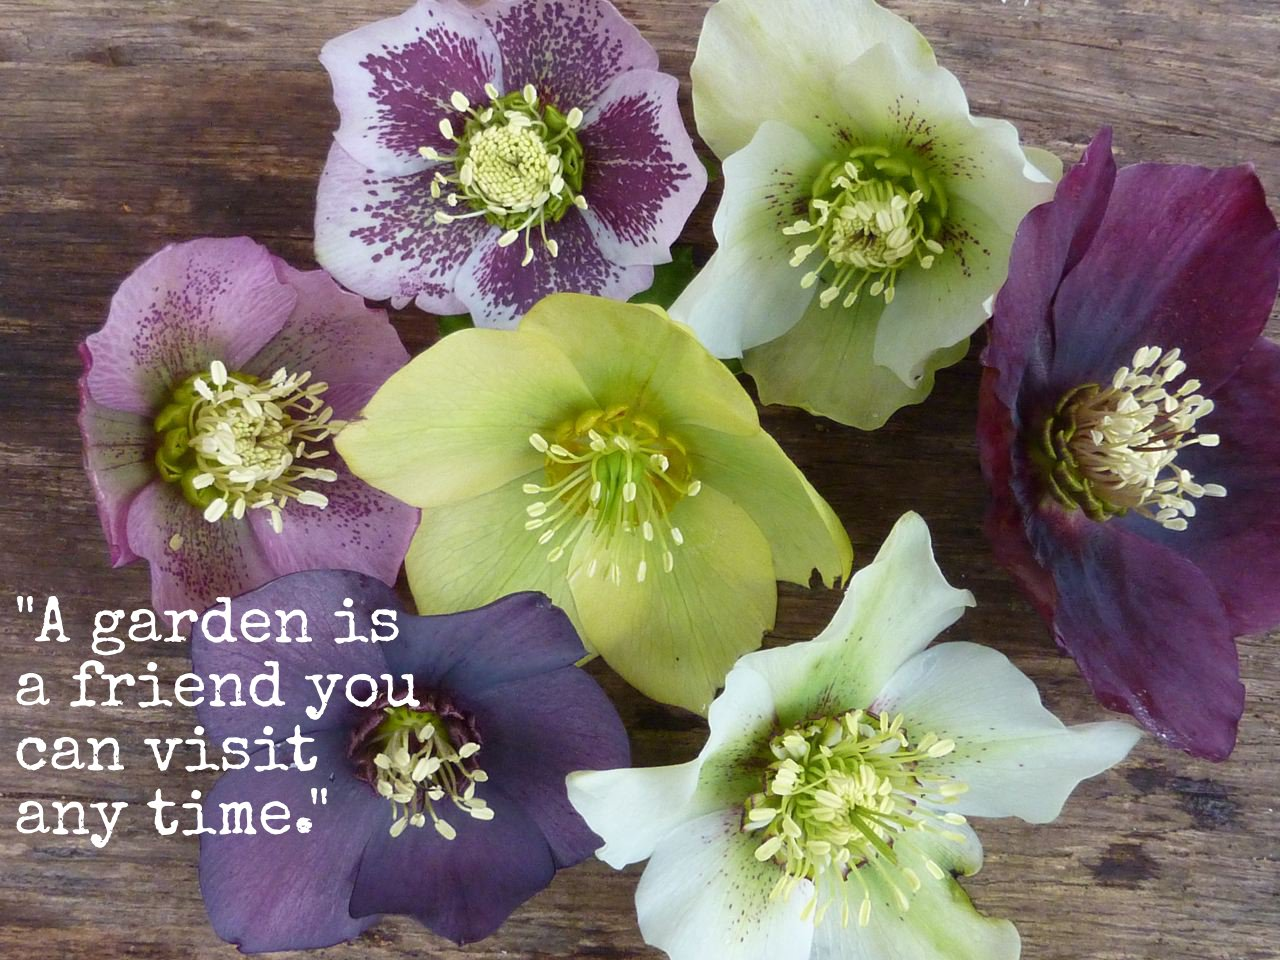 Gardening quote #2